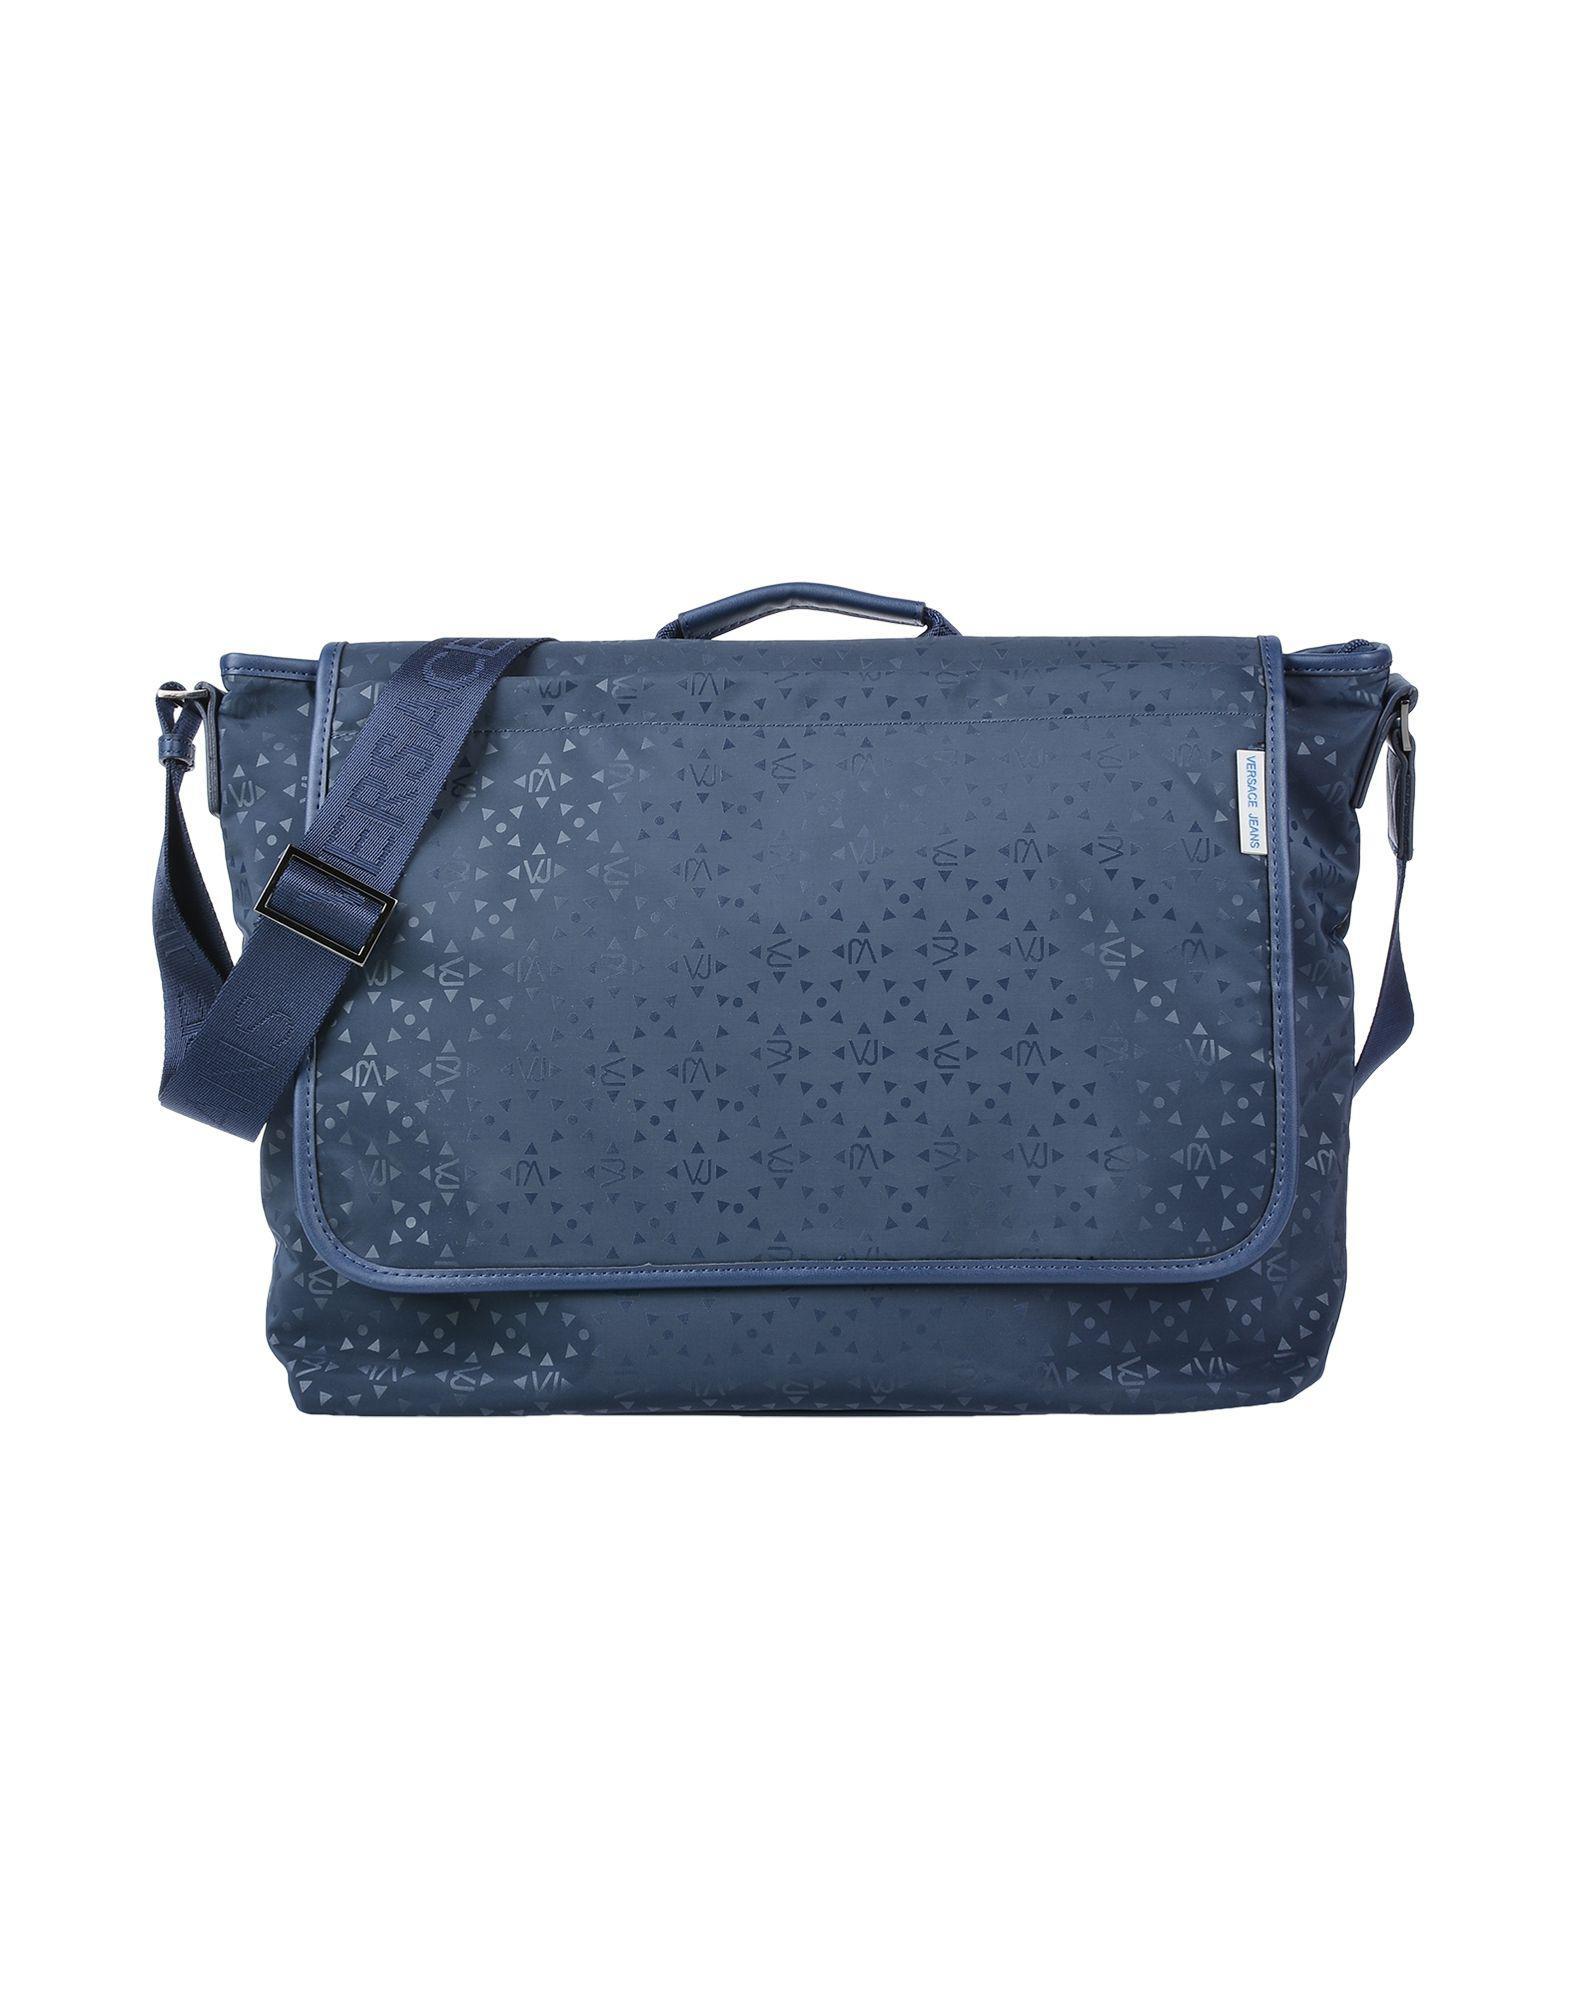 25a9feab1480 Versace Jeans - Blue Cross-body Bag - Lyst. View fullscreen